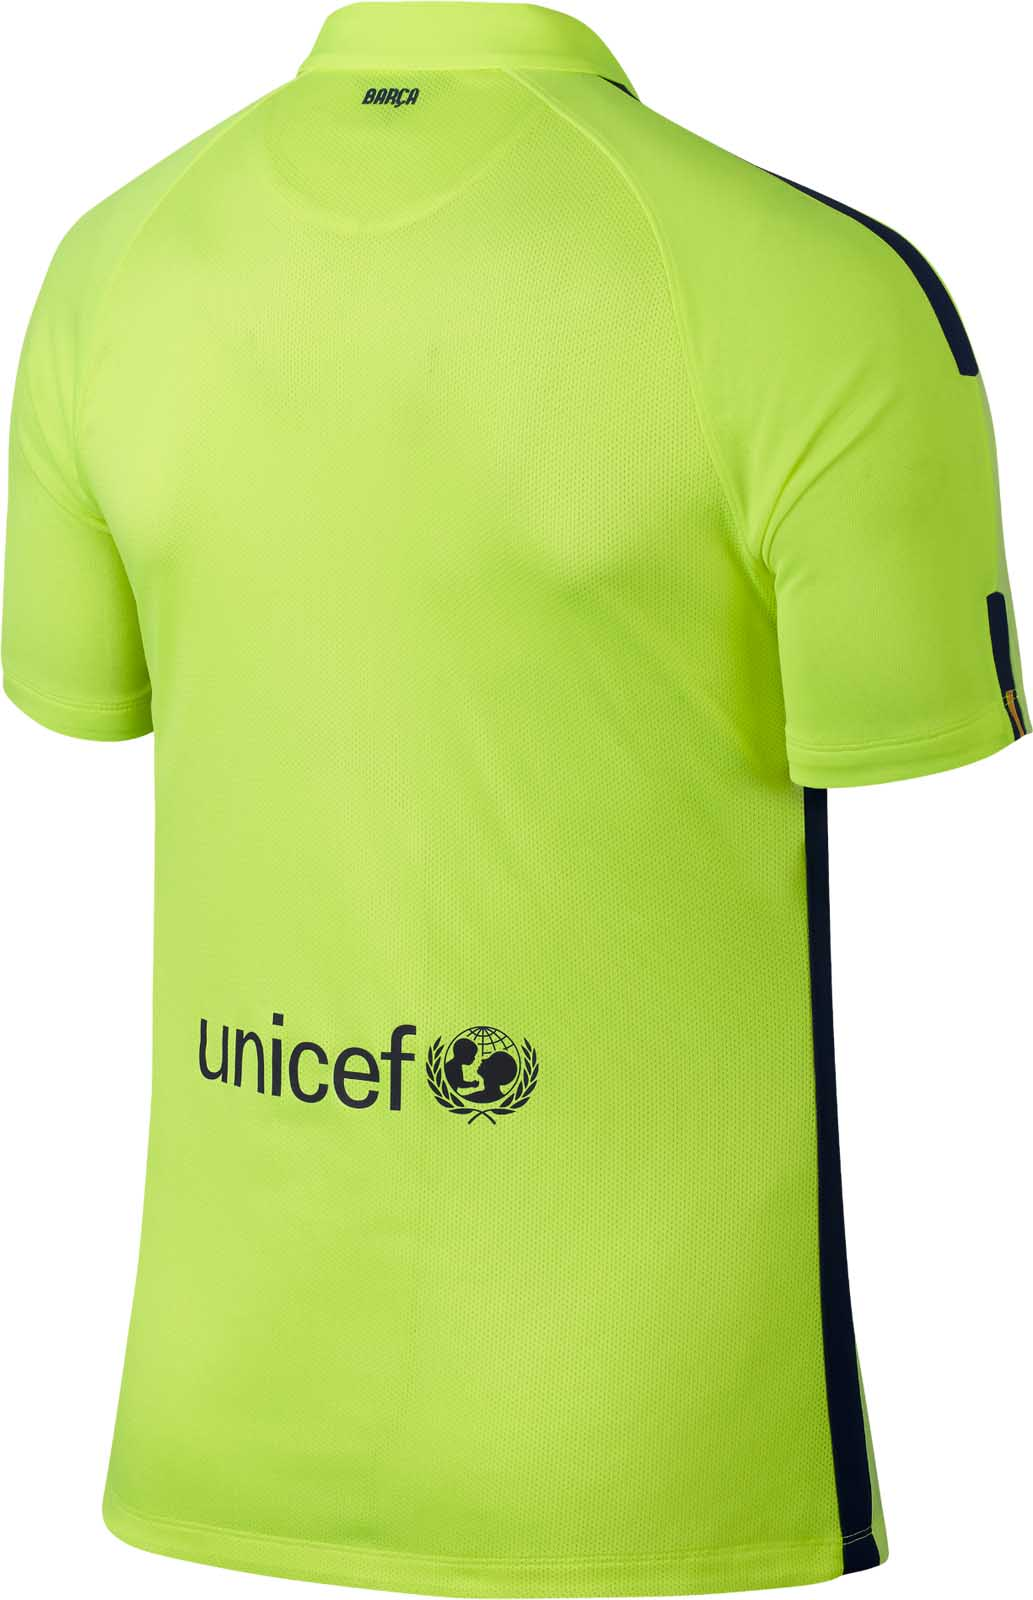 on sale 2bf4b 3620a aliexpress fc barcelona away kit 201415 youth e09f4 485bb